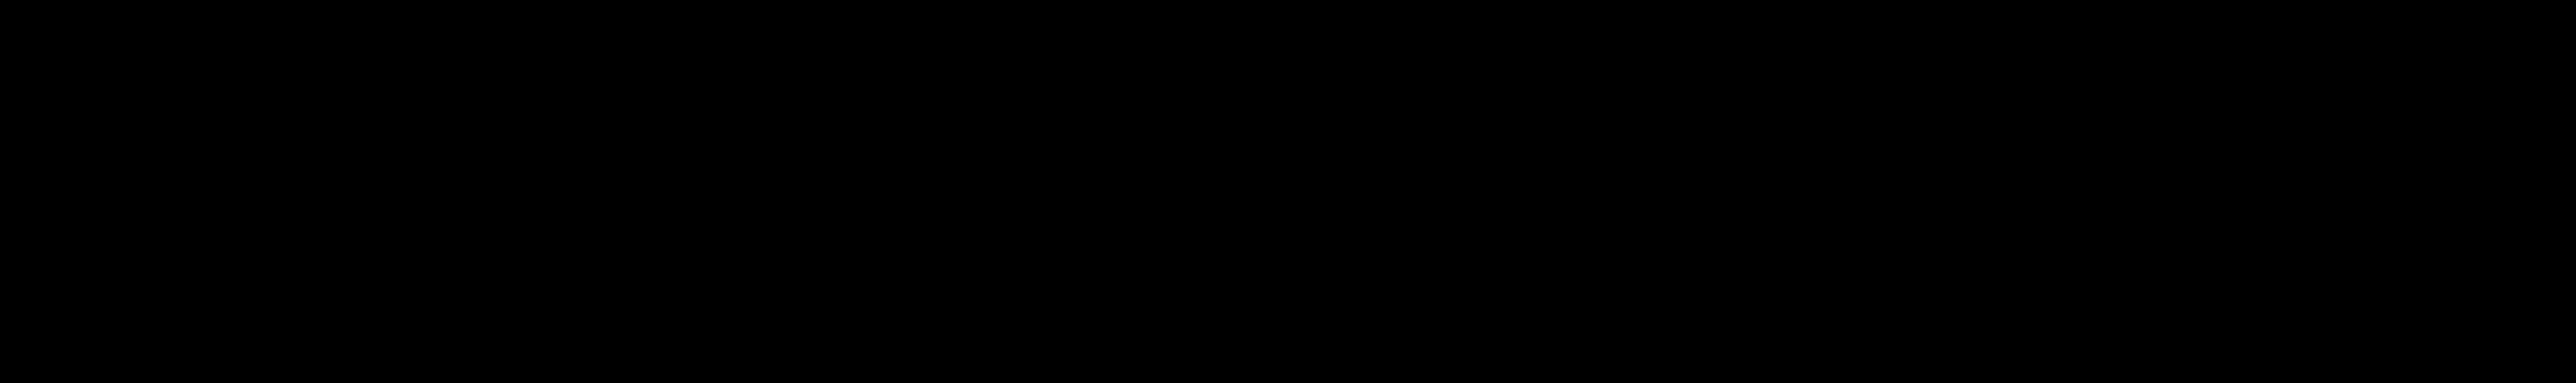 Sheesh media banner logo black